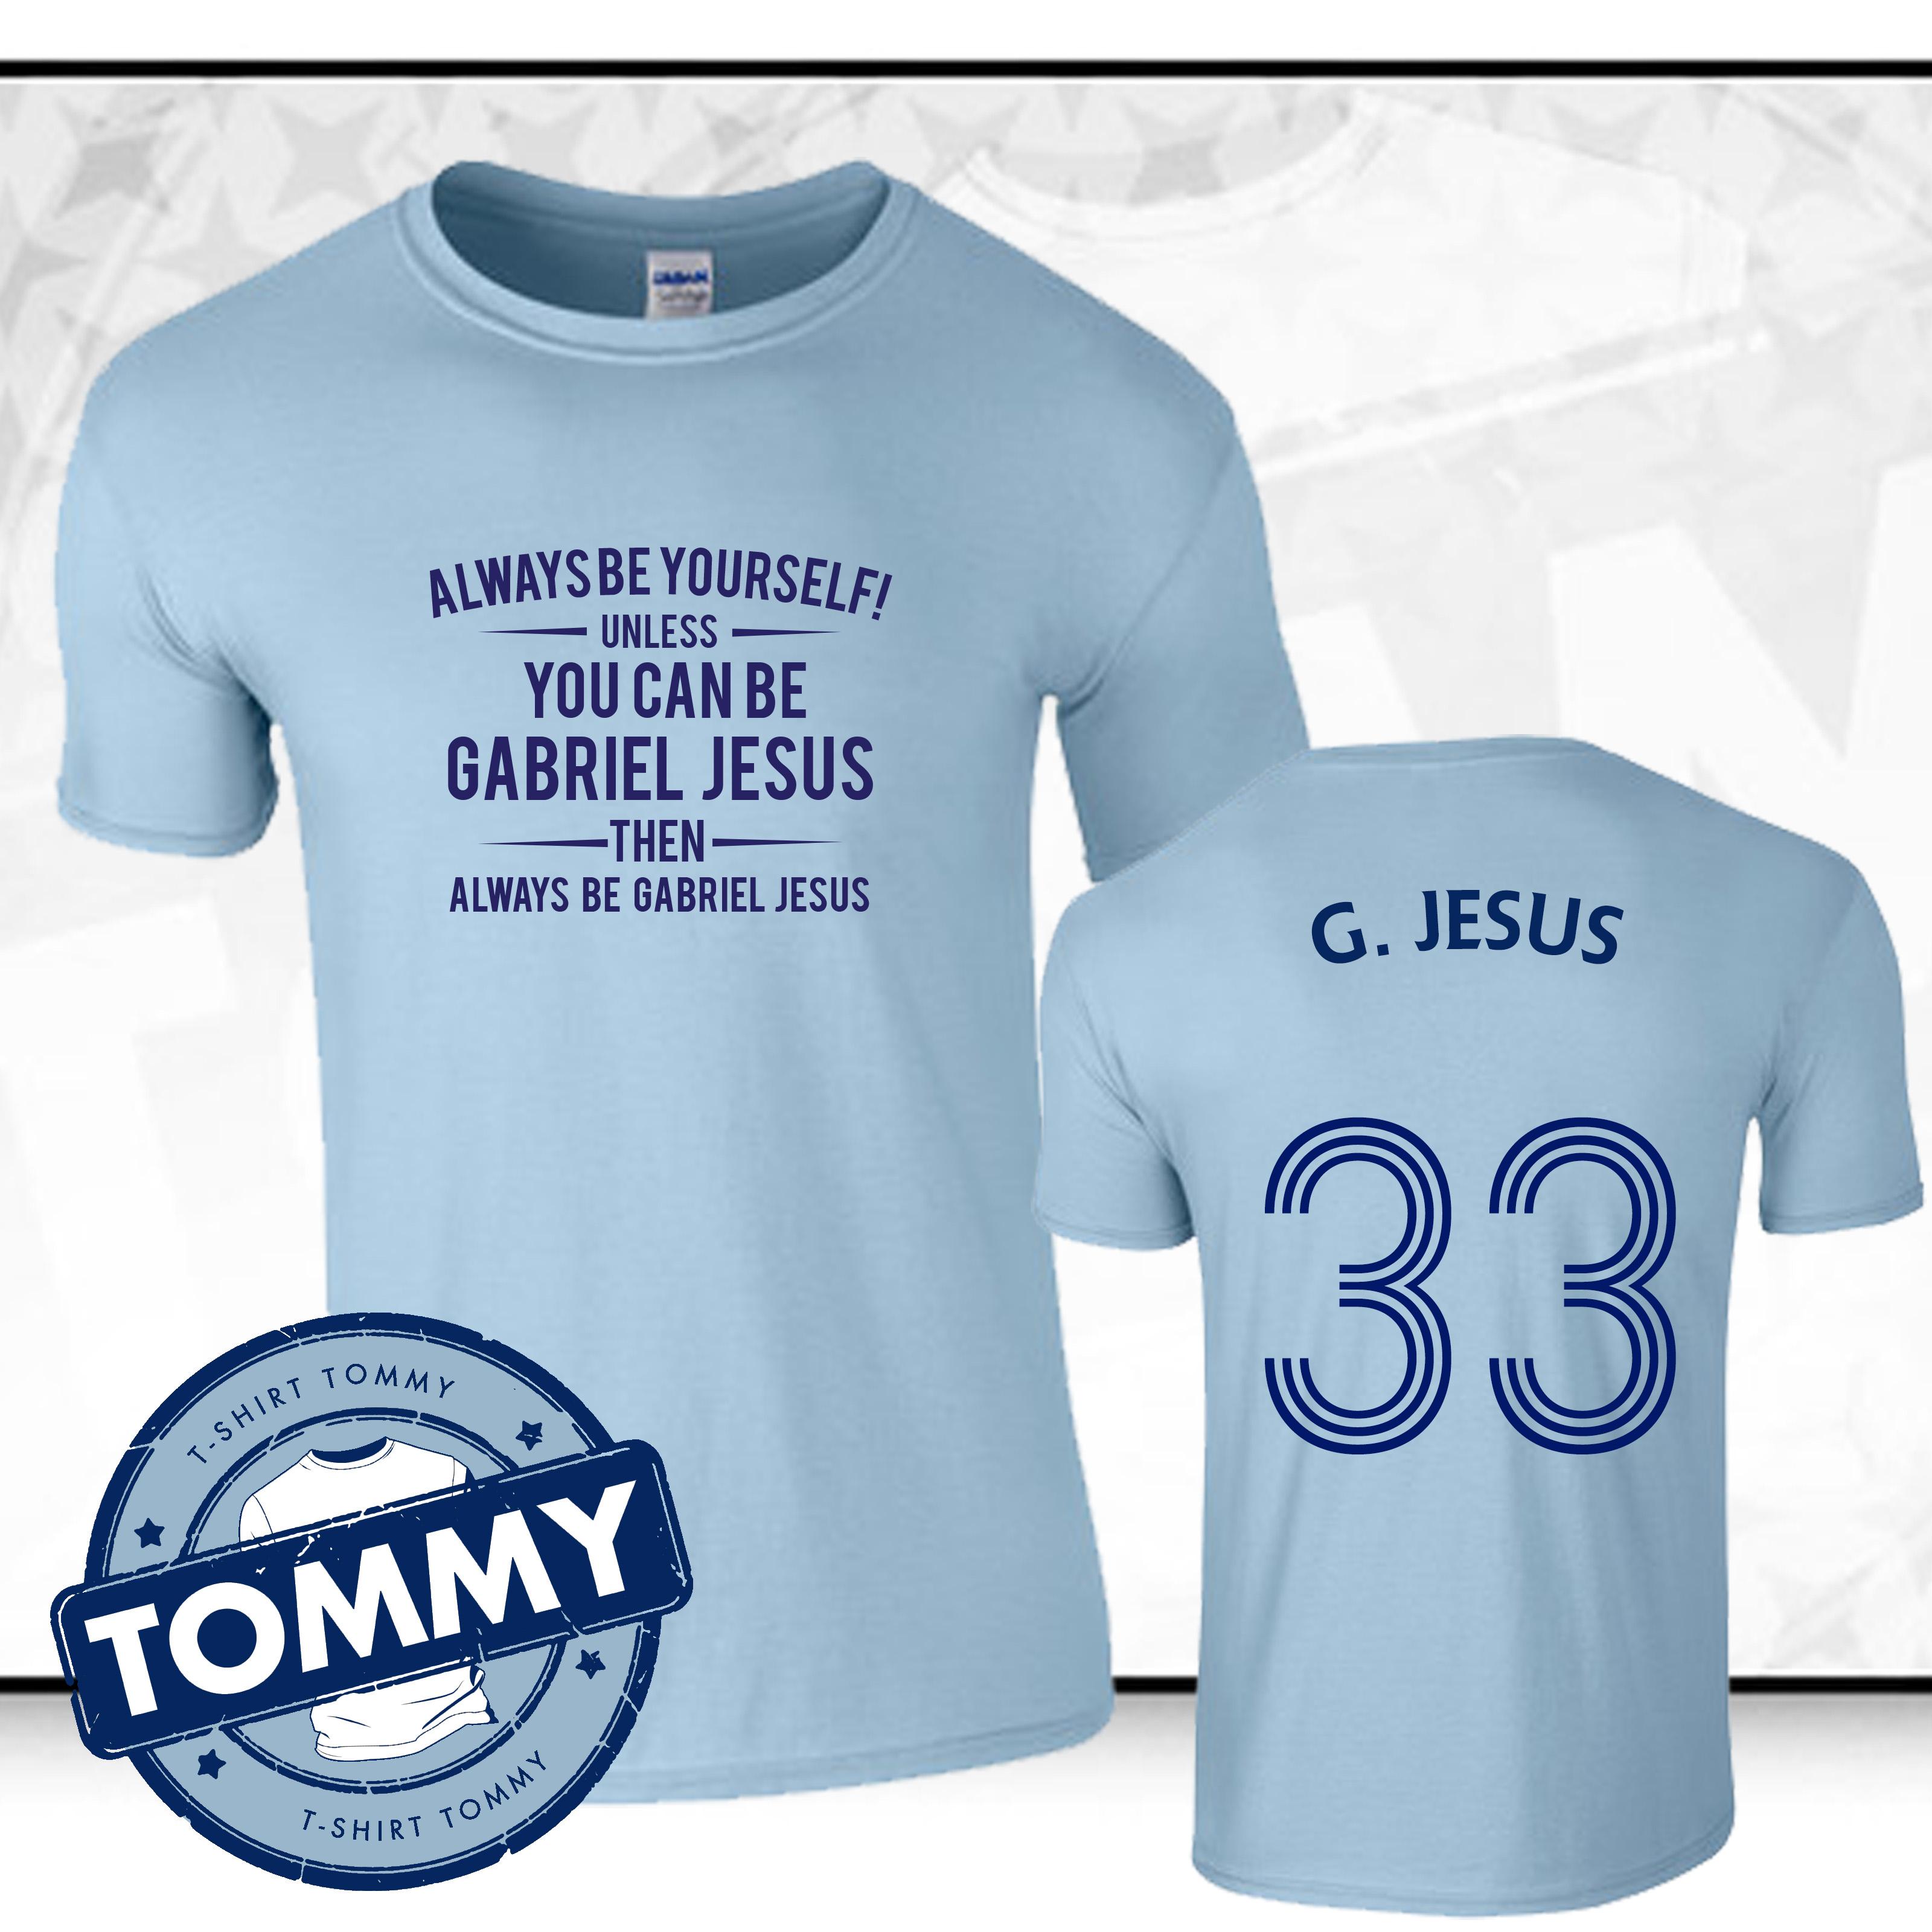 check out bbc40 6e113 Details about Man City Always Be... Gabriel Jesus T-Shirt Jesus Man City  Football T Shirt